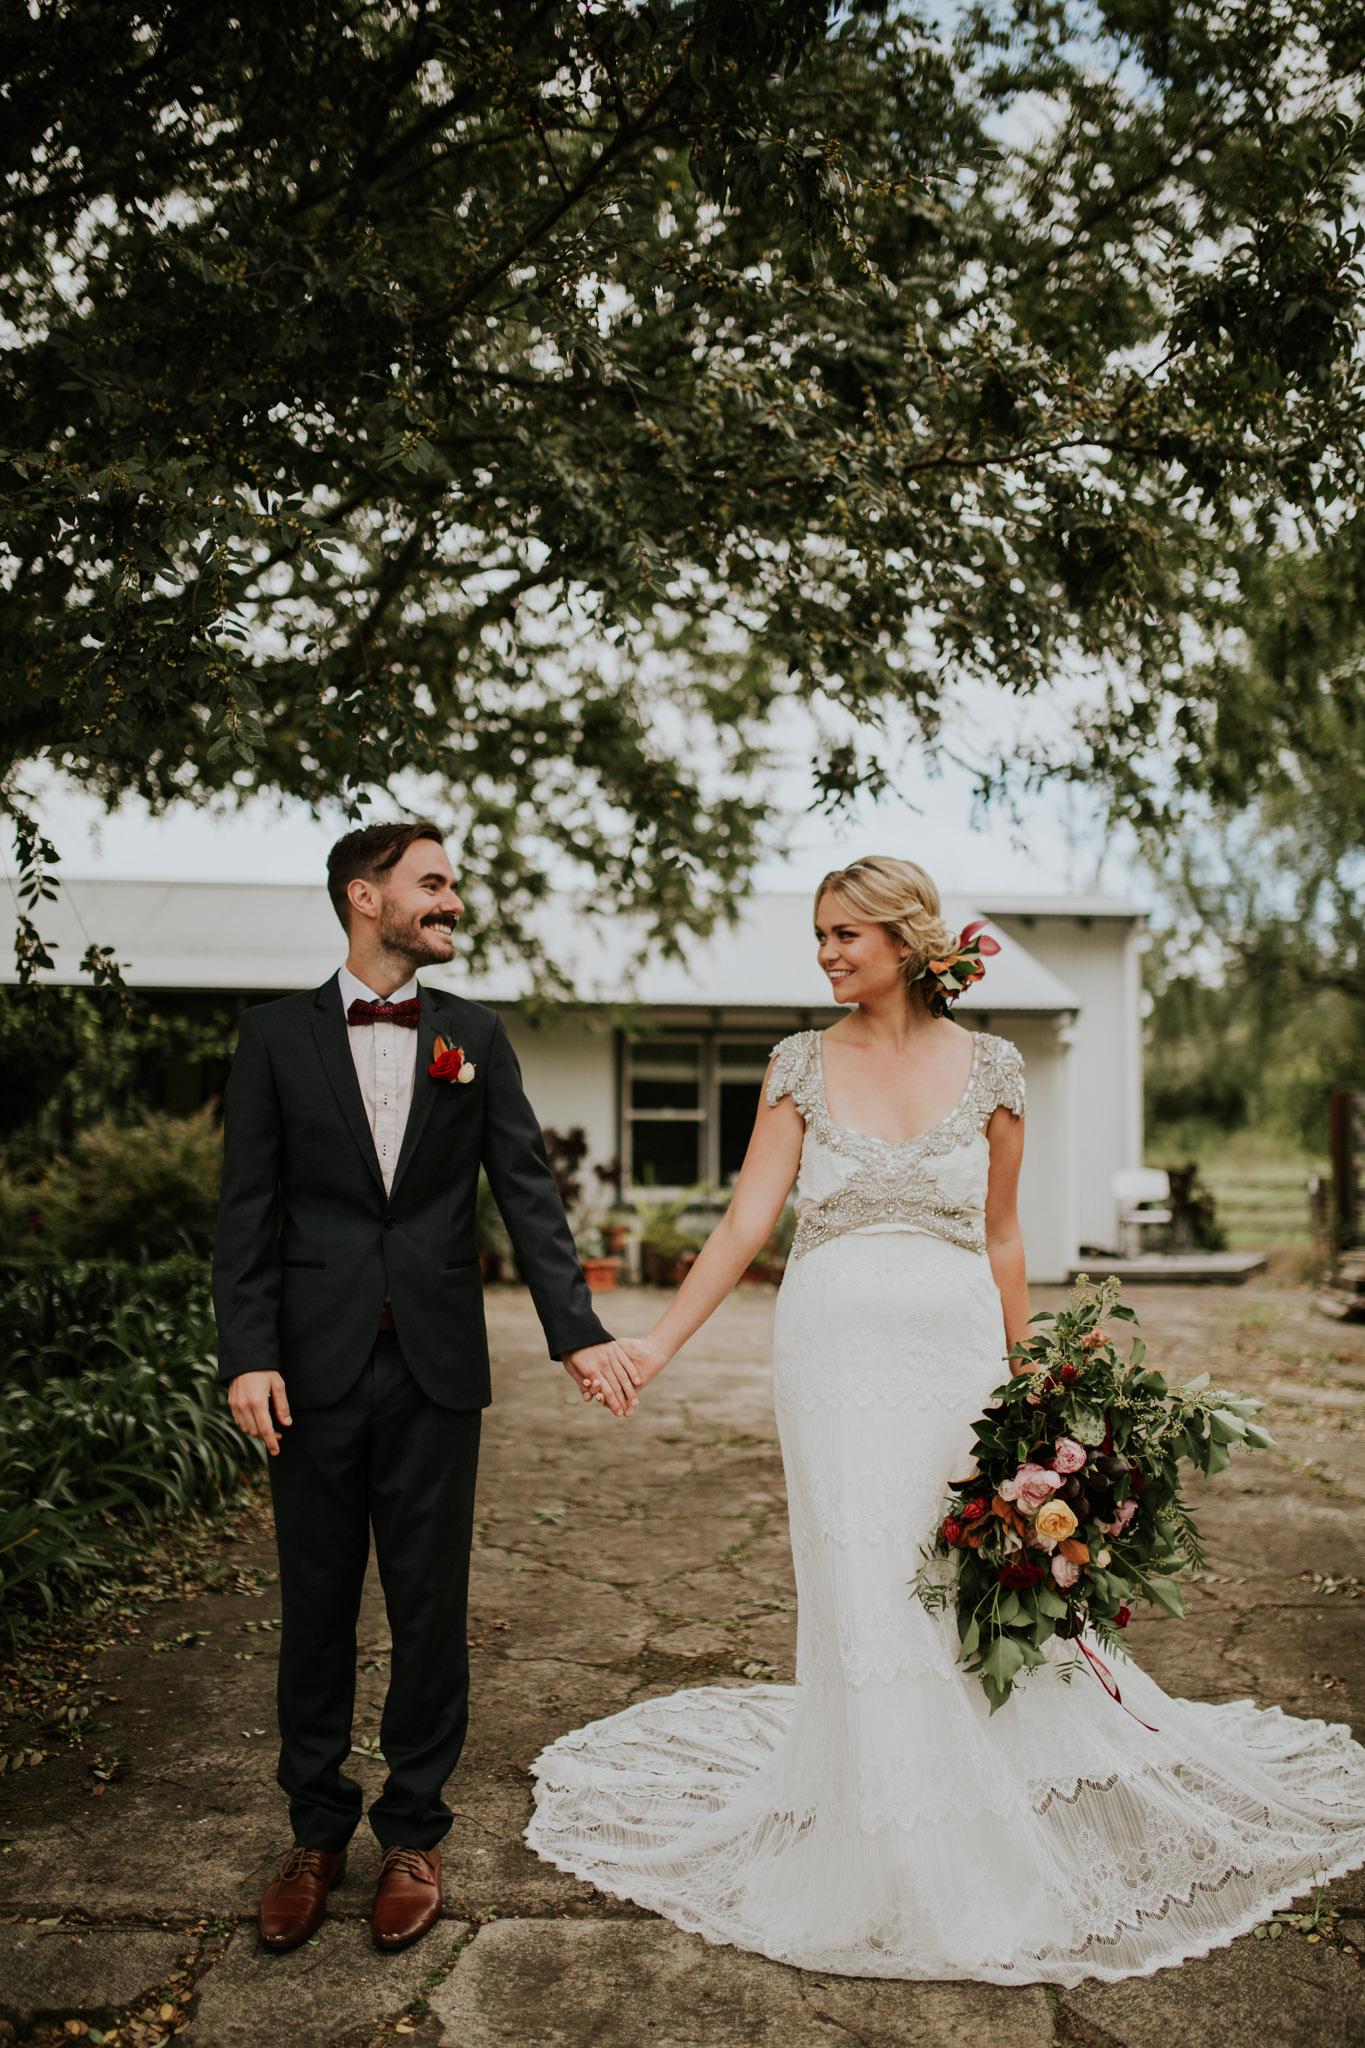 SPRING-GROVE-DAIRY-WEDDING-61.jpg